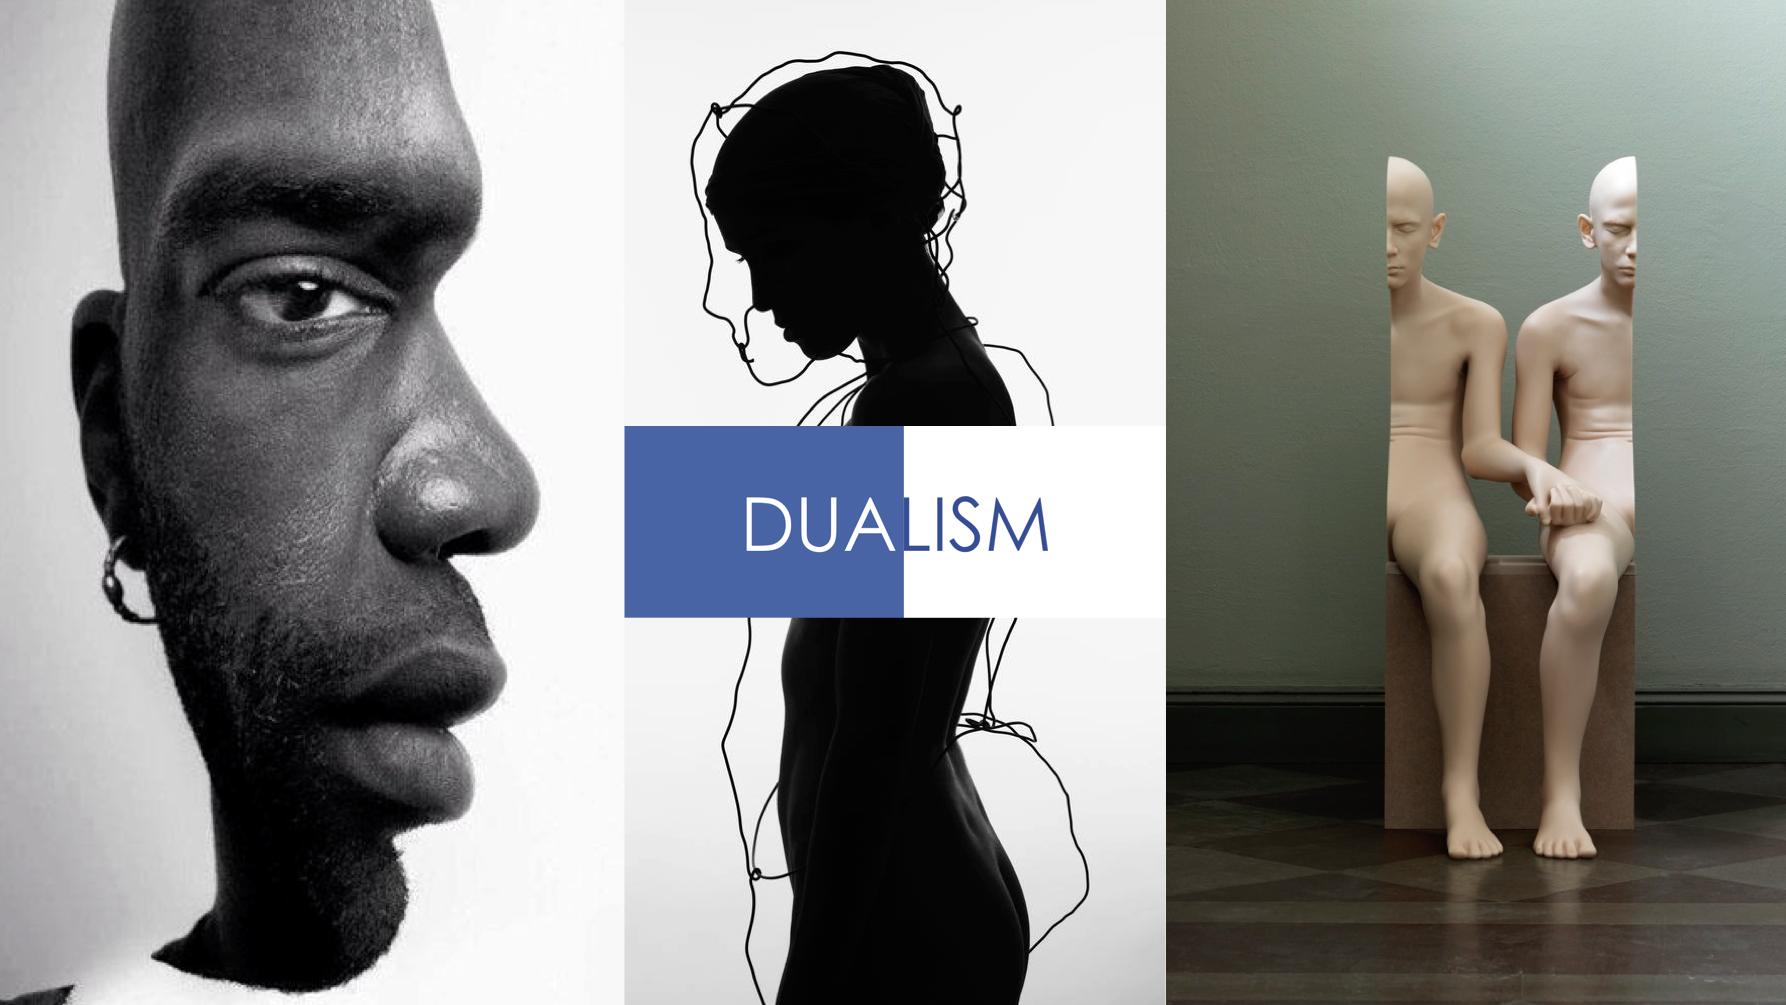 Examples of dualism in design.